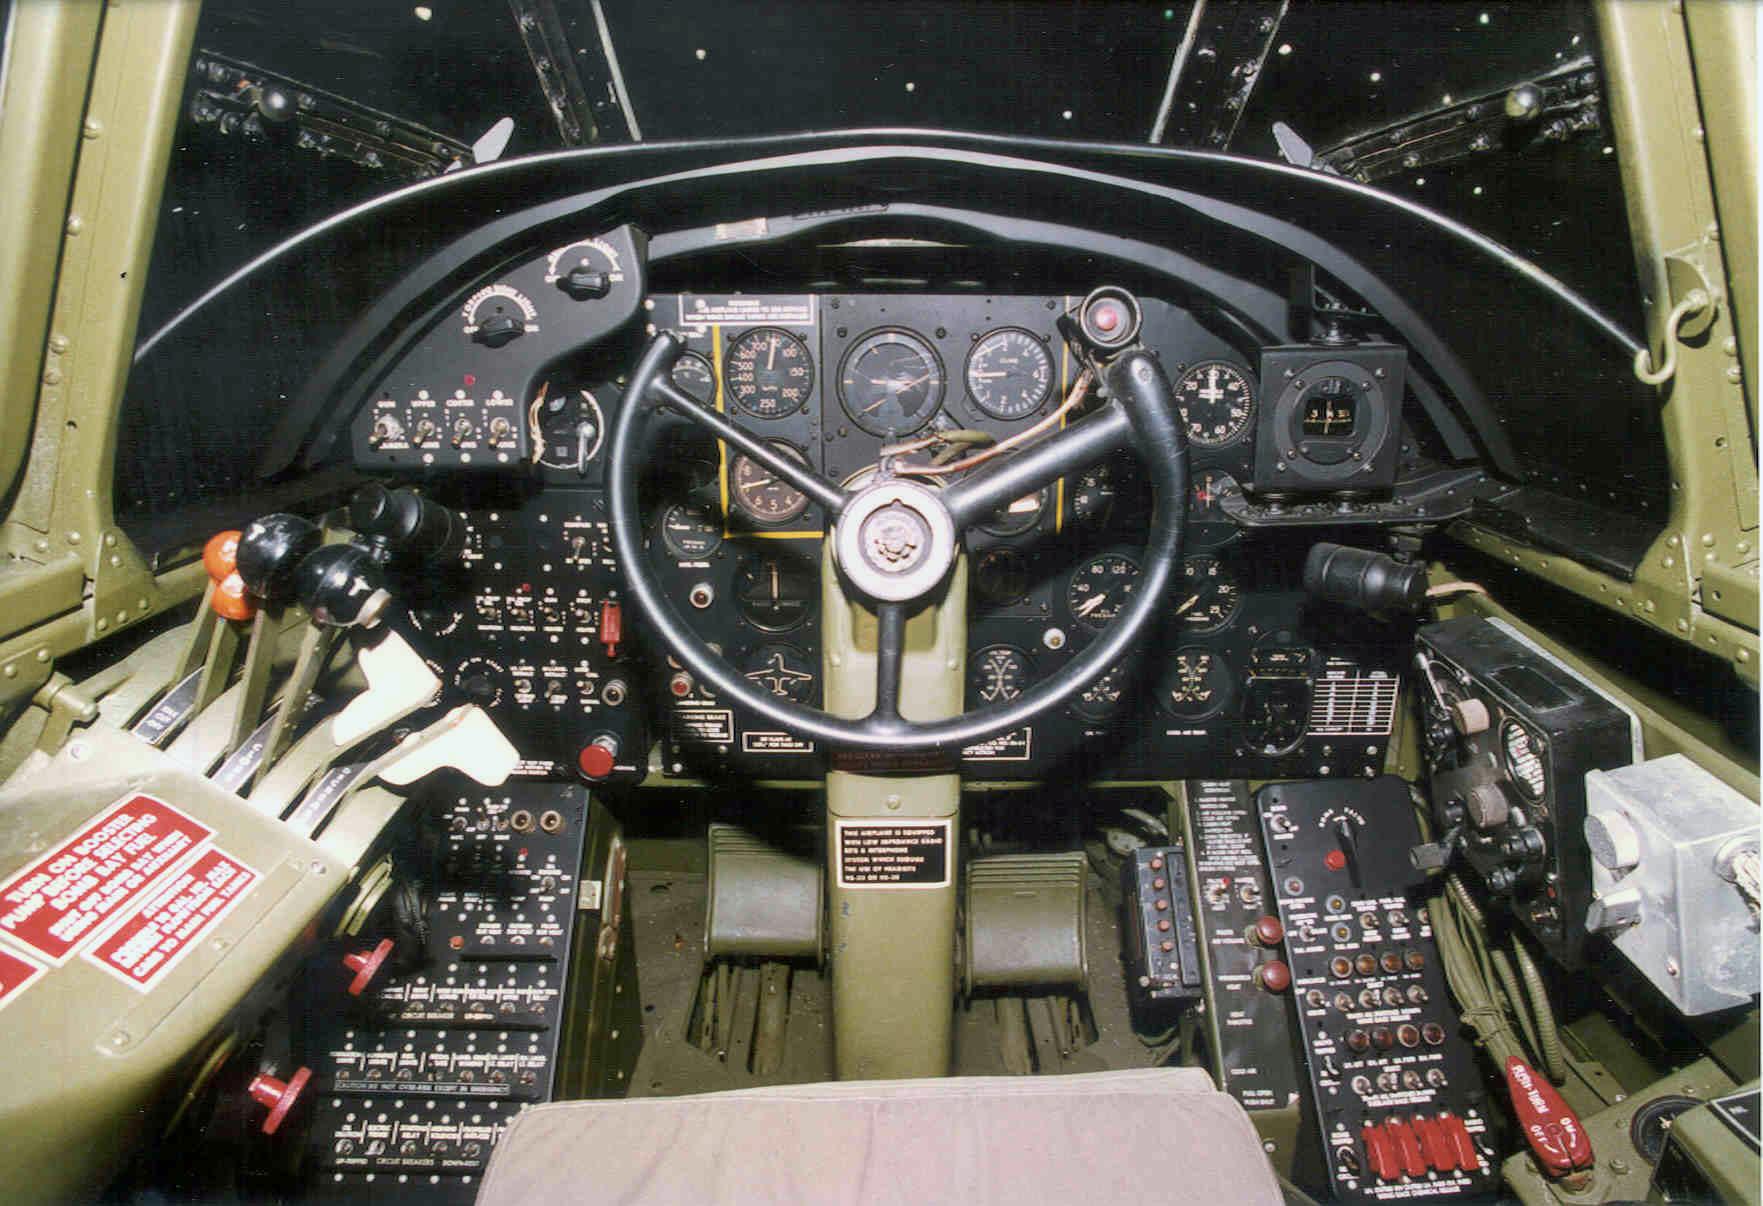 Douglas_A-20G_Havoc_cockpit_3_USAF.jpg